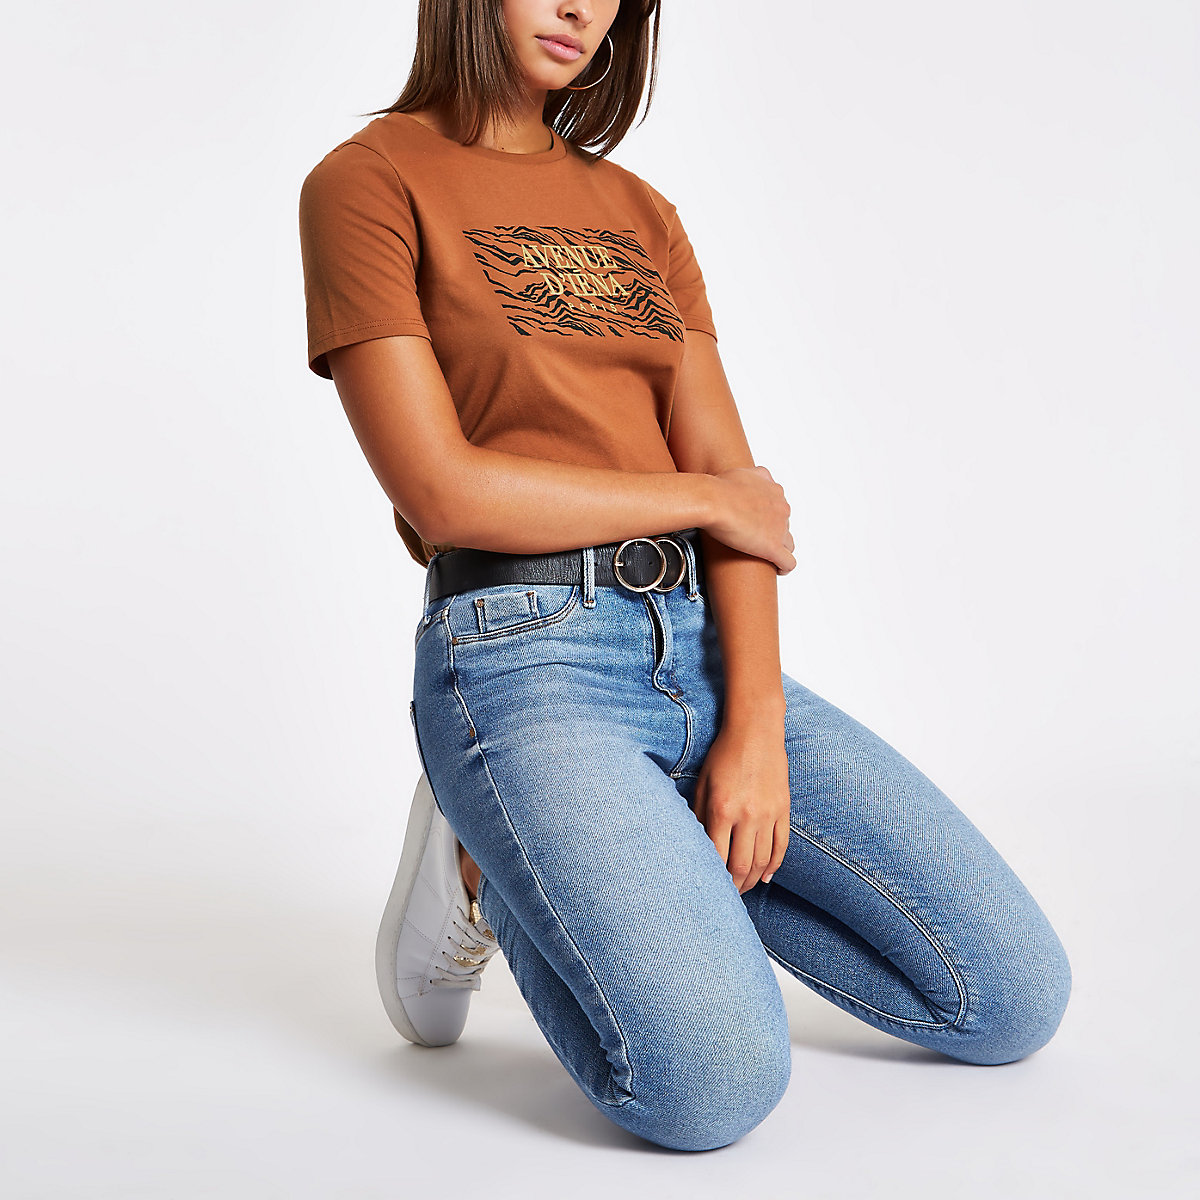 Brown 'Avenue d'iena' print crew neck T-shirt